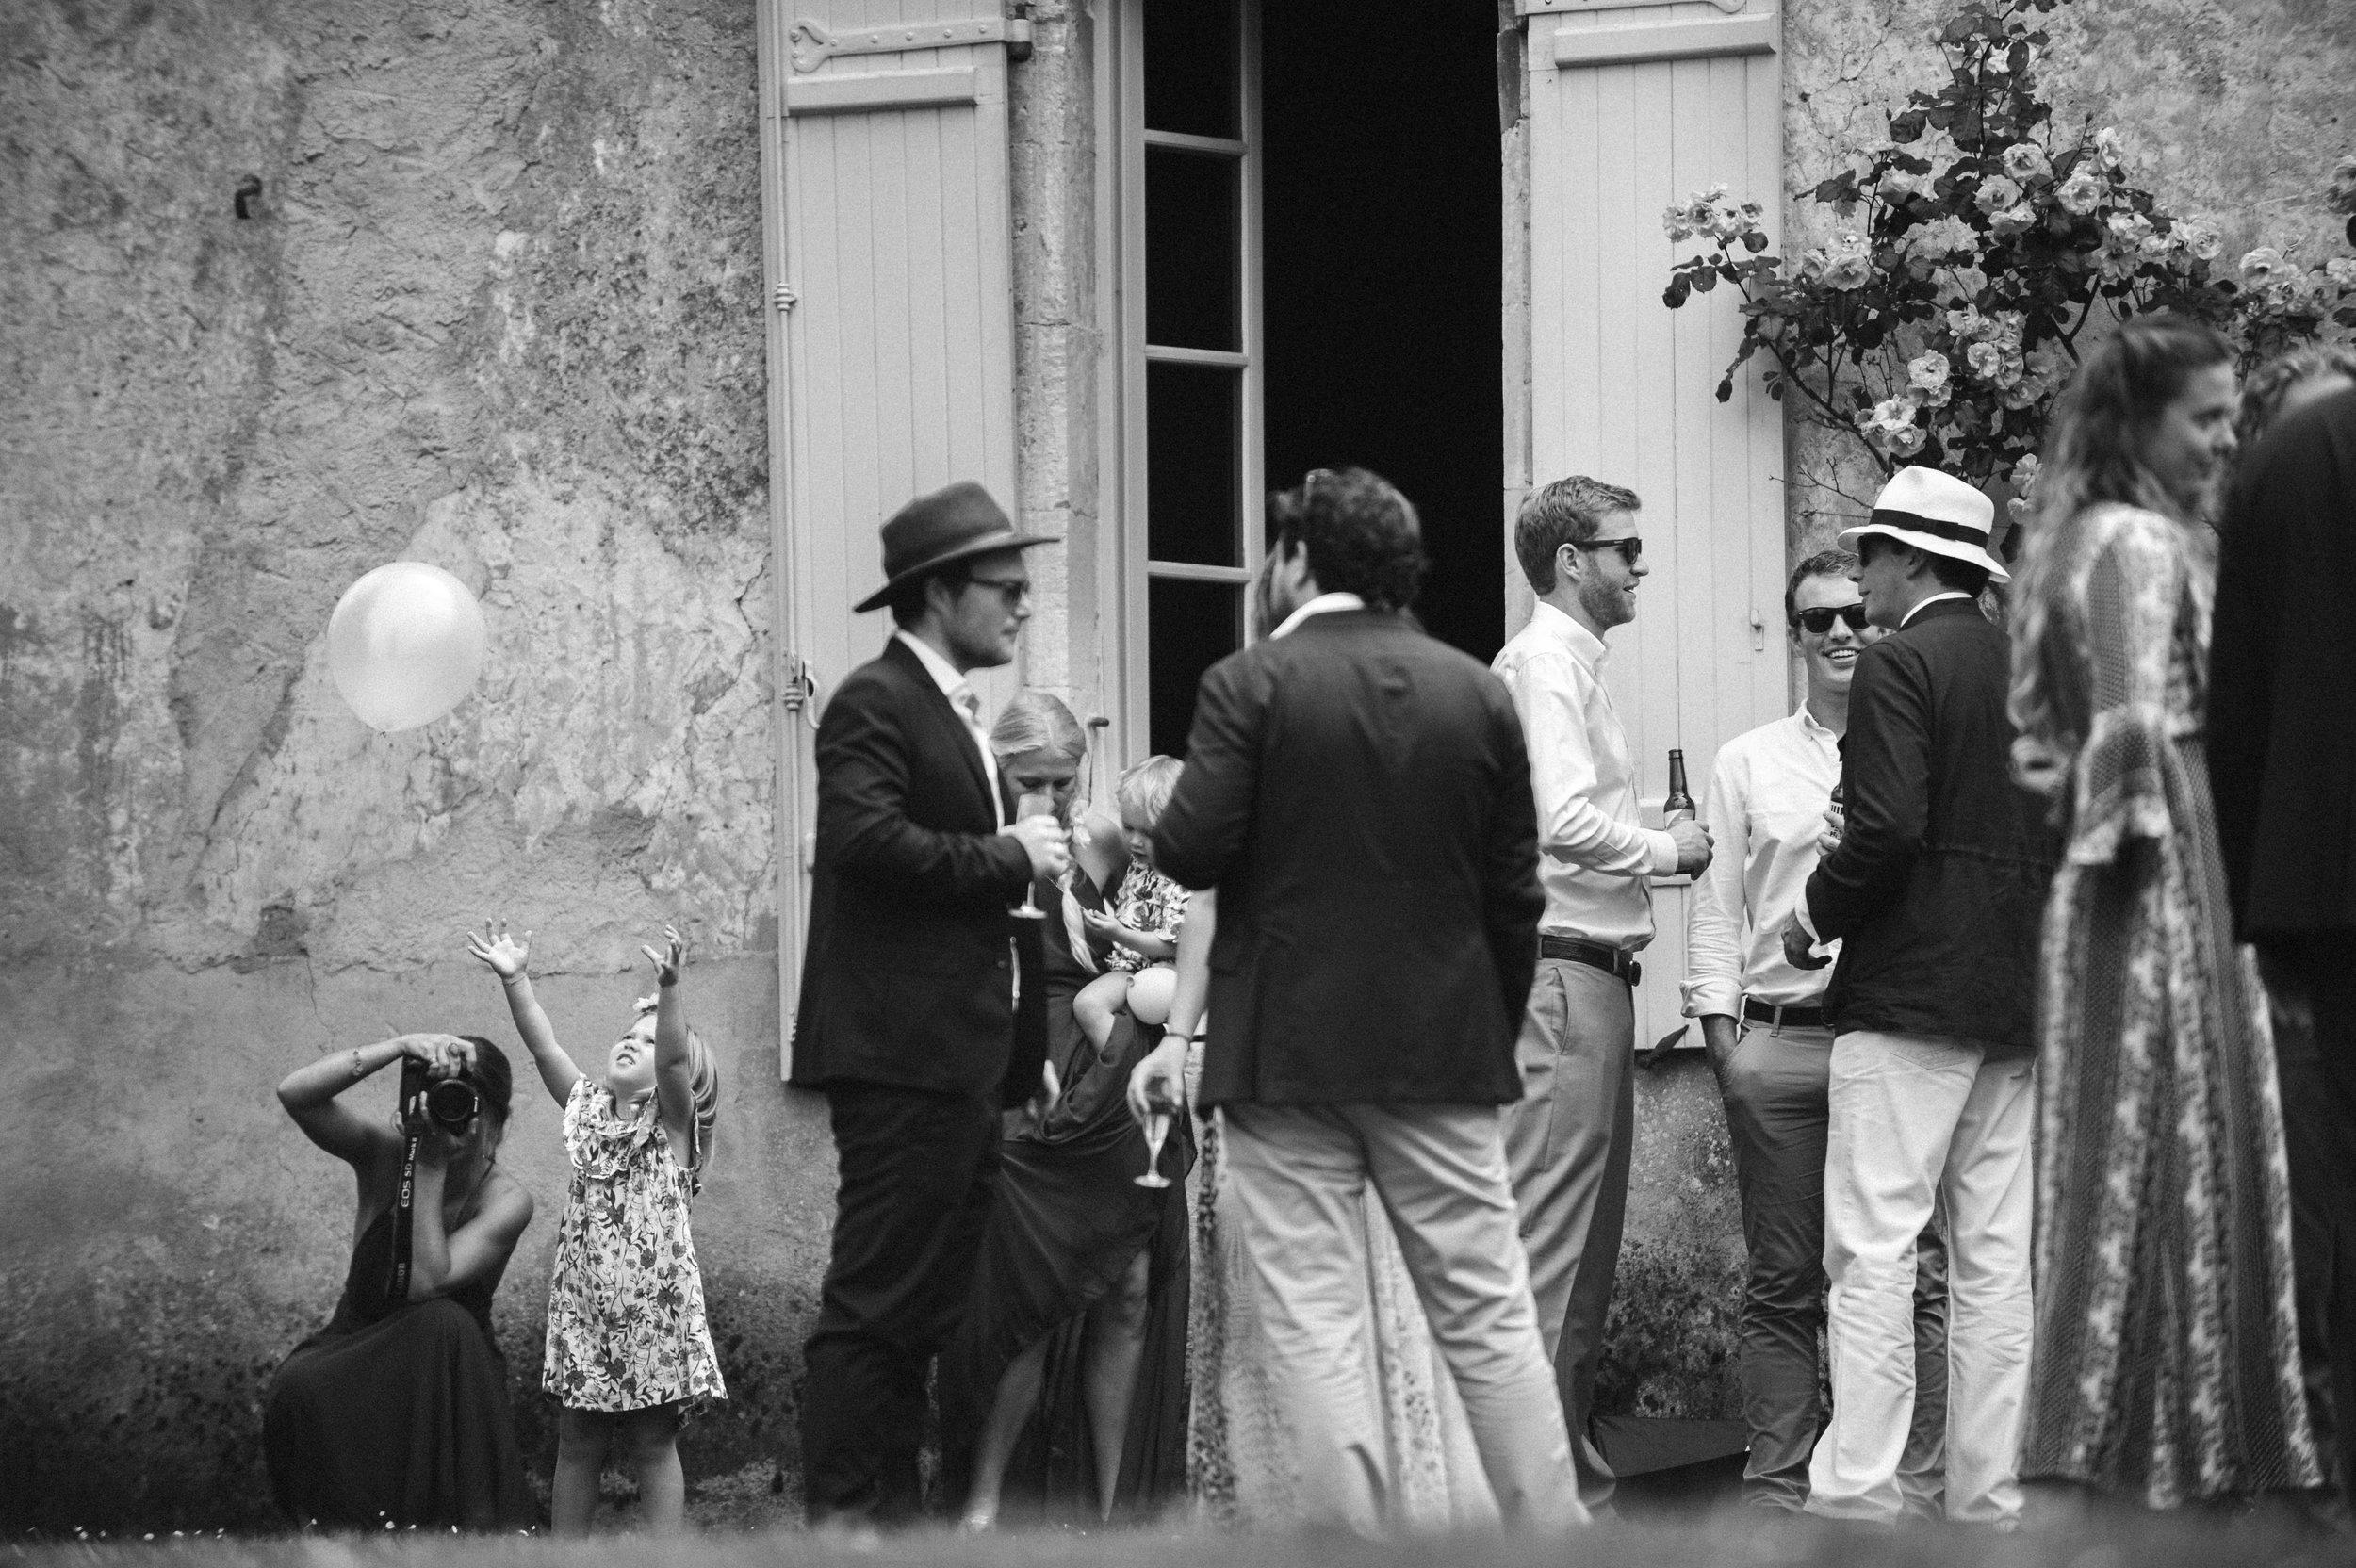 wedding-photographer-dordogne-mark-shaw-22.jpg